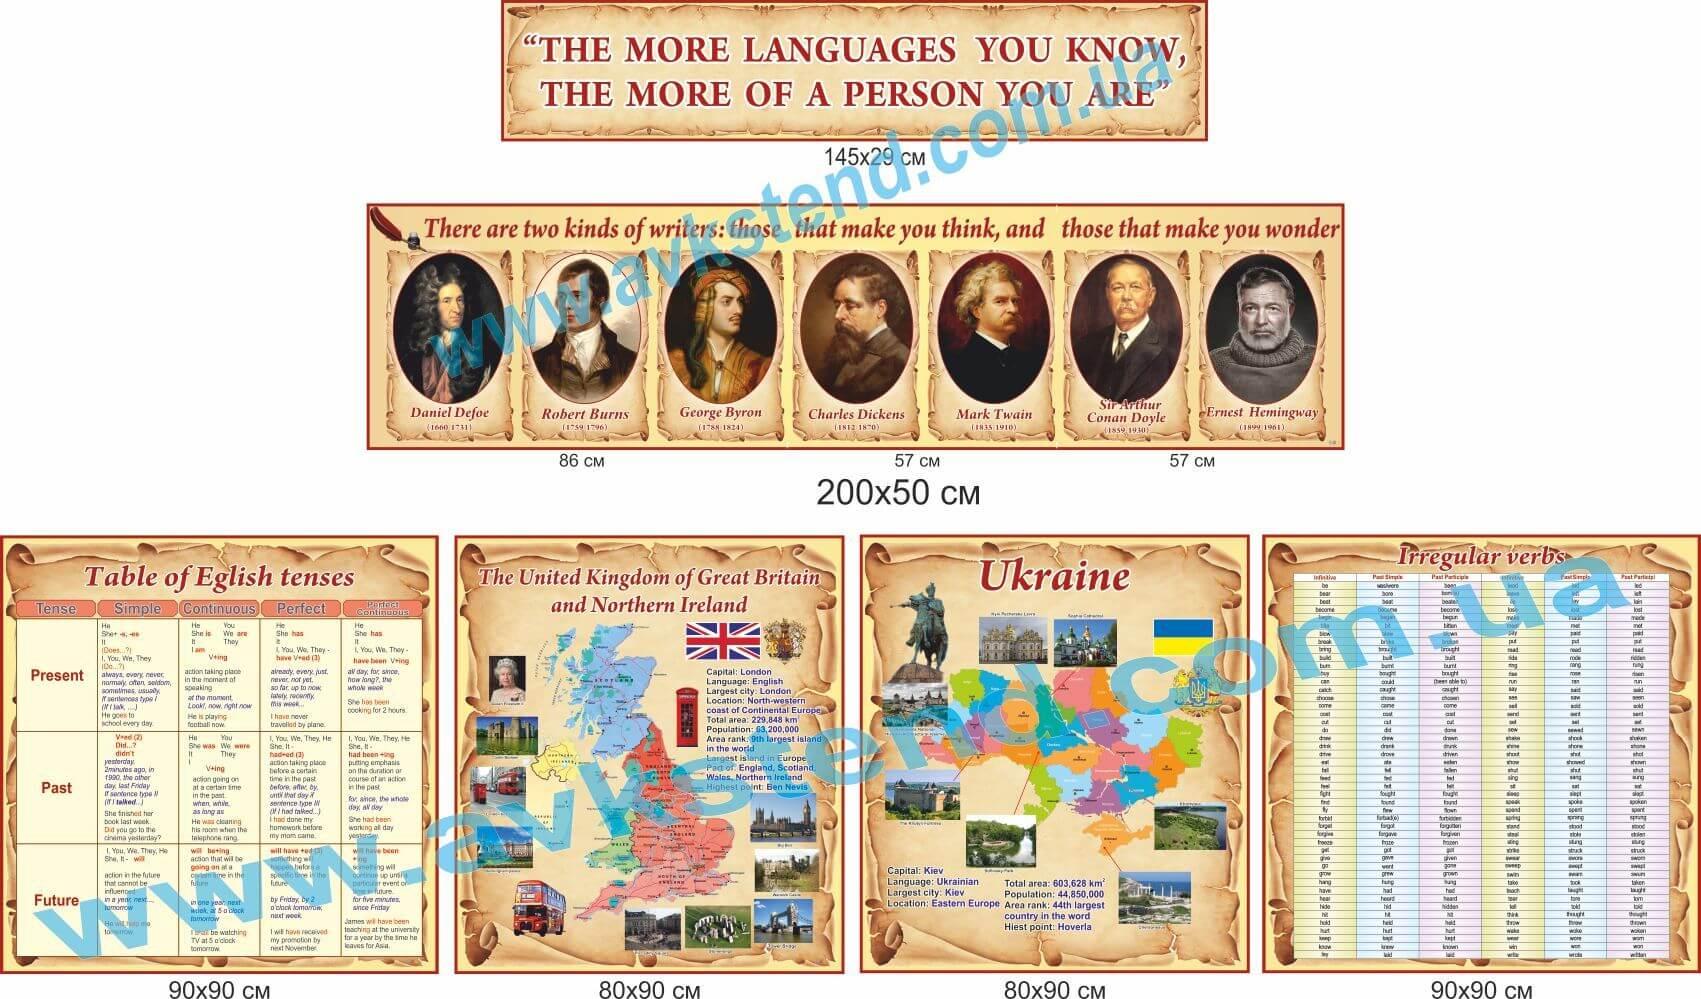 стенди для кабінету іноземної мови, стенды для кабинета иностранного языка, стенди для кабінету англійської мови купити, кабінет англійської мови, стенди для шкільних кабінетів замовити, стенды для кабинета английского языка купить, кабинет английского языка, стенды для школьных кабинетов заказать, стенди для школи купити, стенди для школи замовити, стенди для кабінету, стенди для шкільного кабінету, оформлення кабінетів, оформлення шкільного кабінету, стенды для школы купить, стенды для школы заказать, стенды для кабинета, стенды для школьного кабинета,